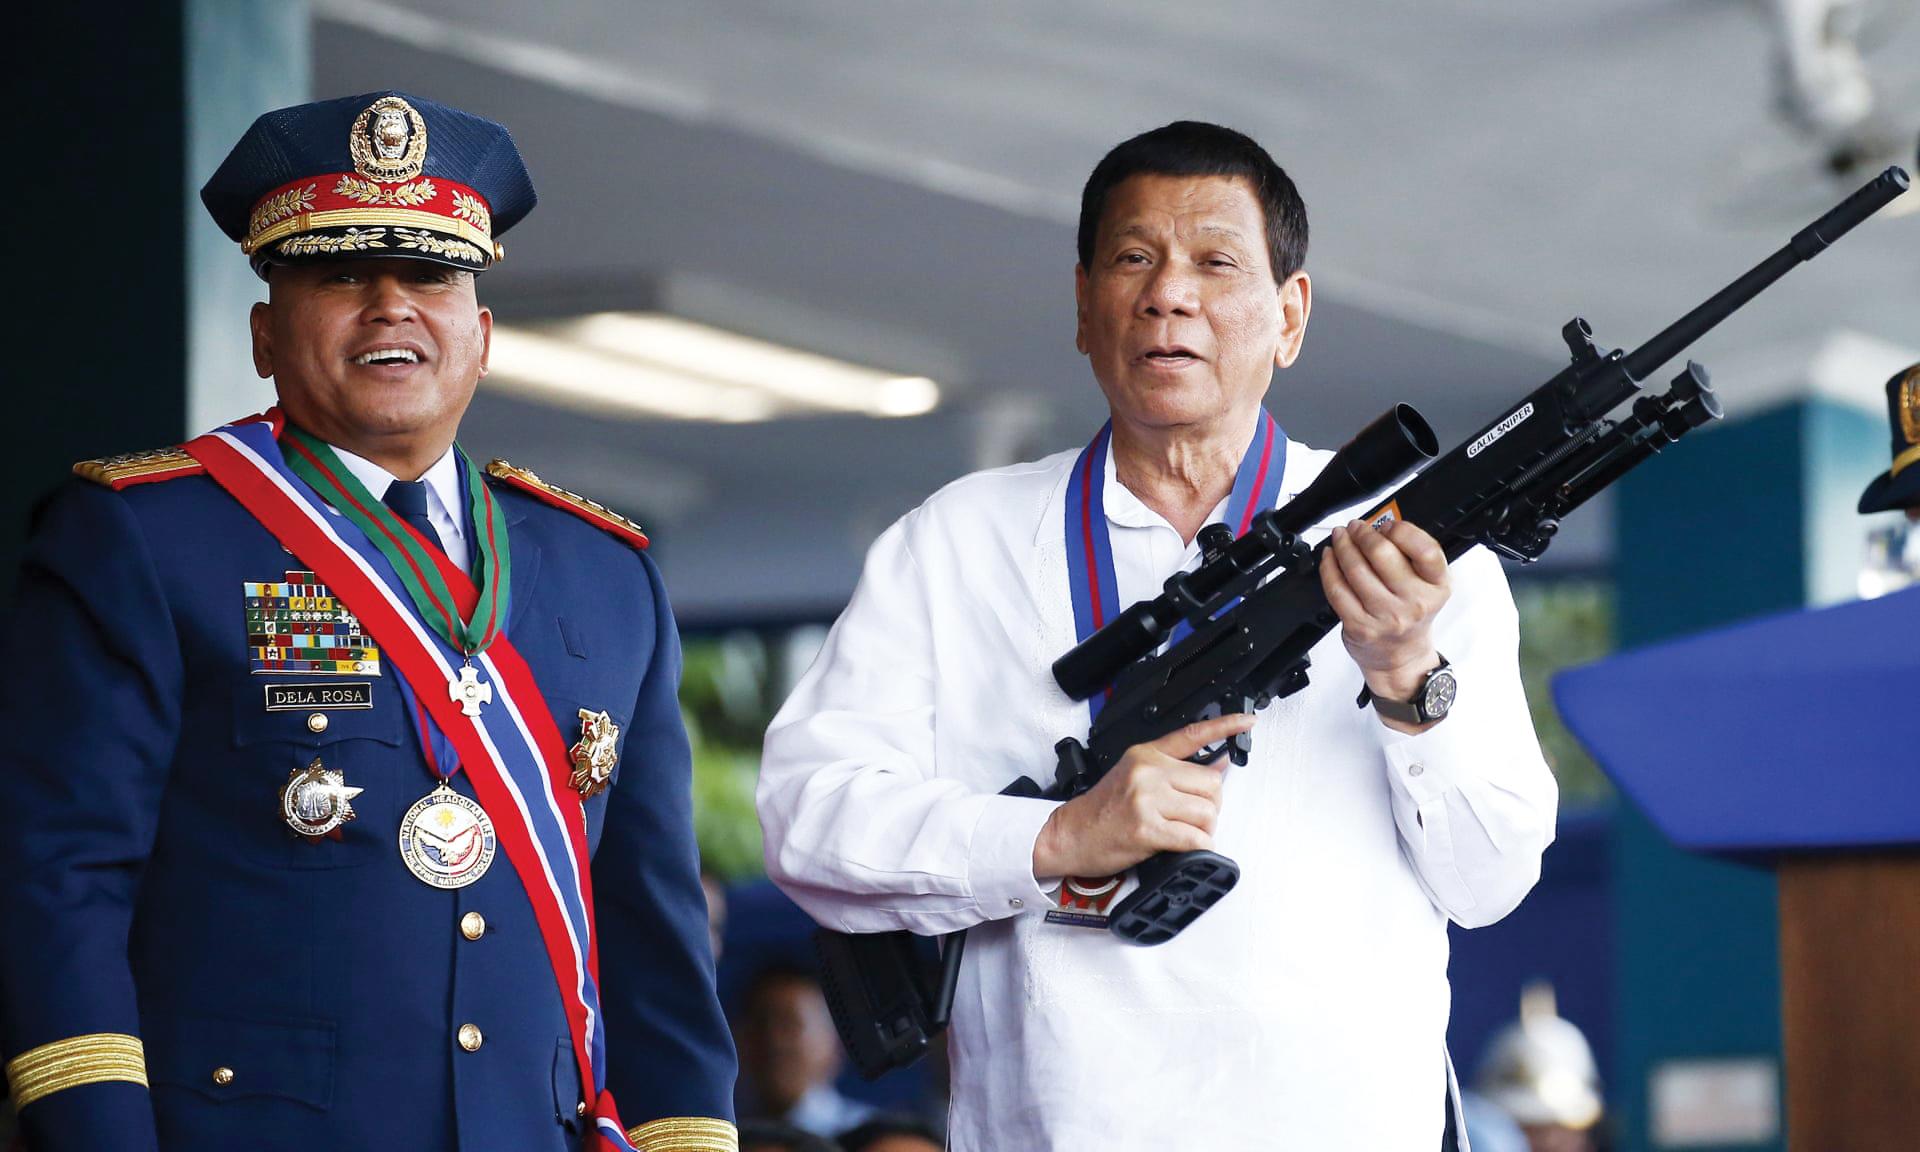 Presidente das Filipinas inicia visita histórica a Israel